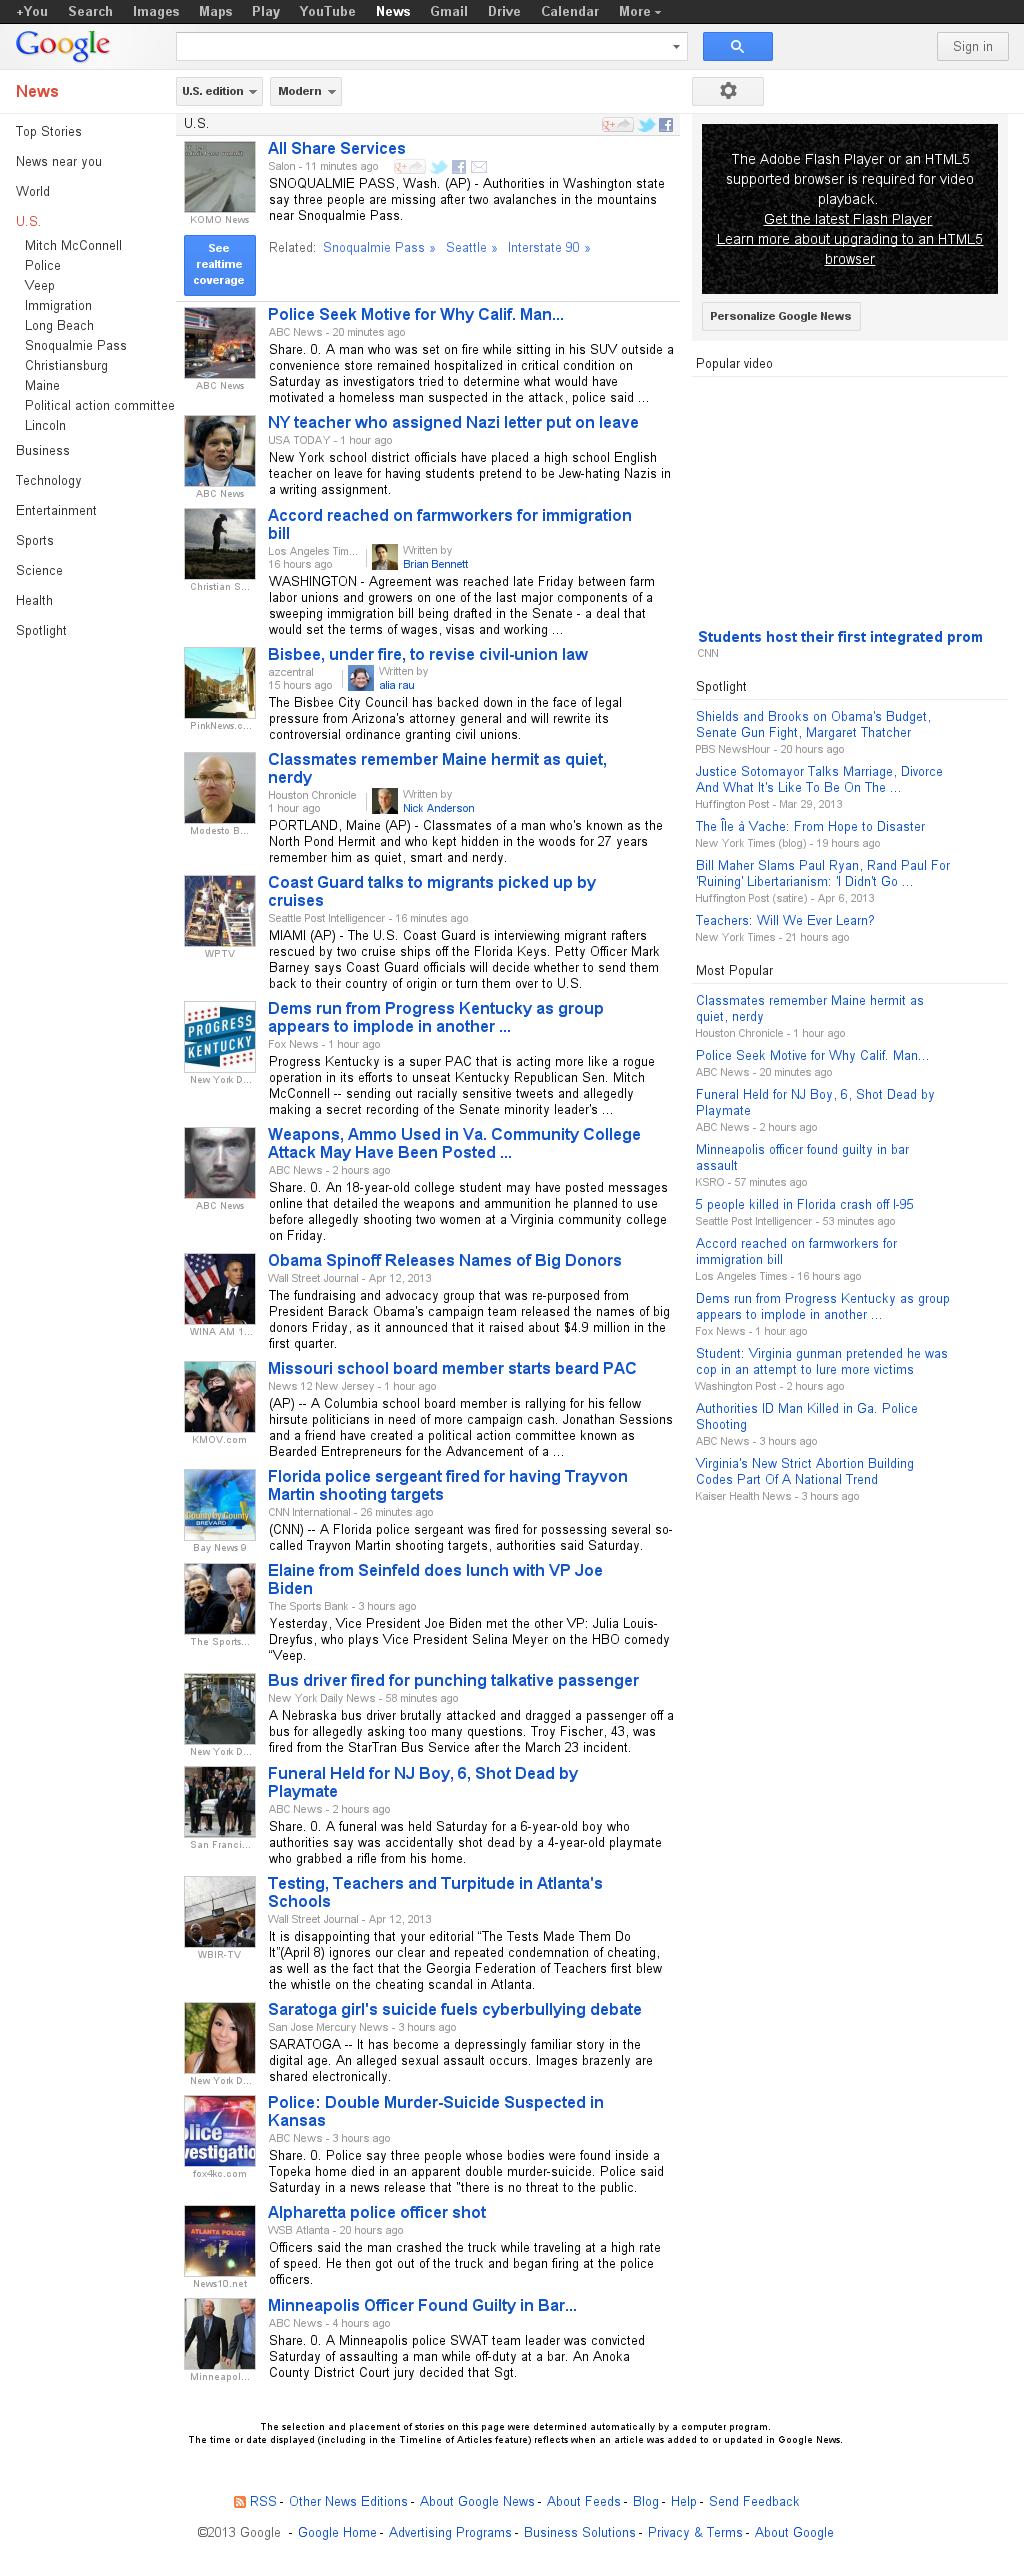 Google News: U.S. at Saturday April 13, 2013, 10:09 p.m. UTC